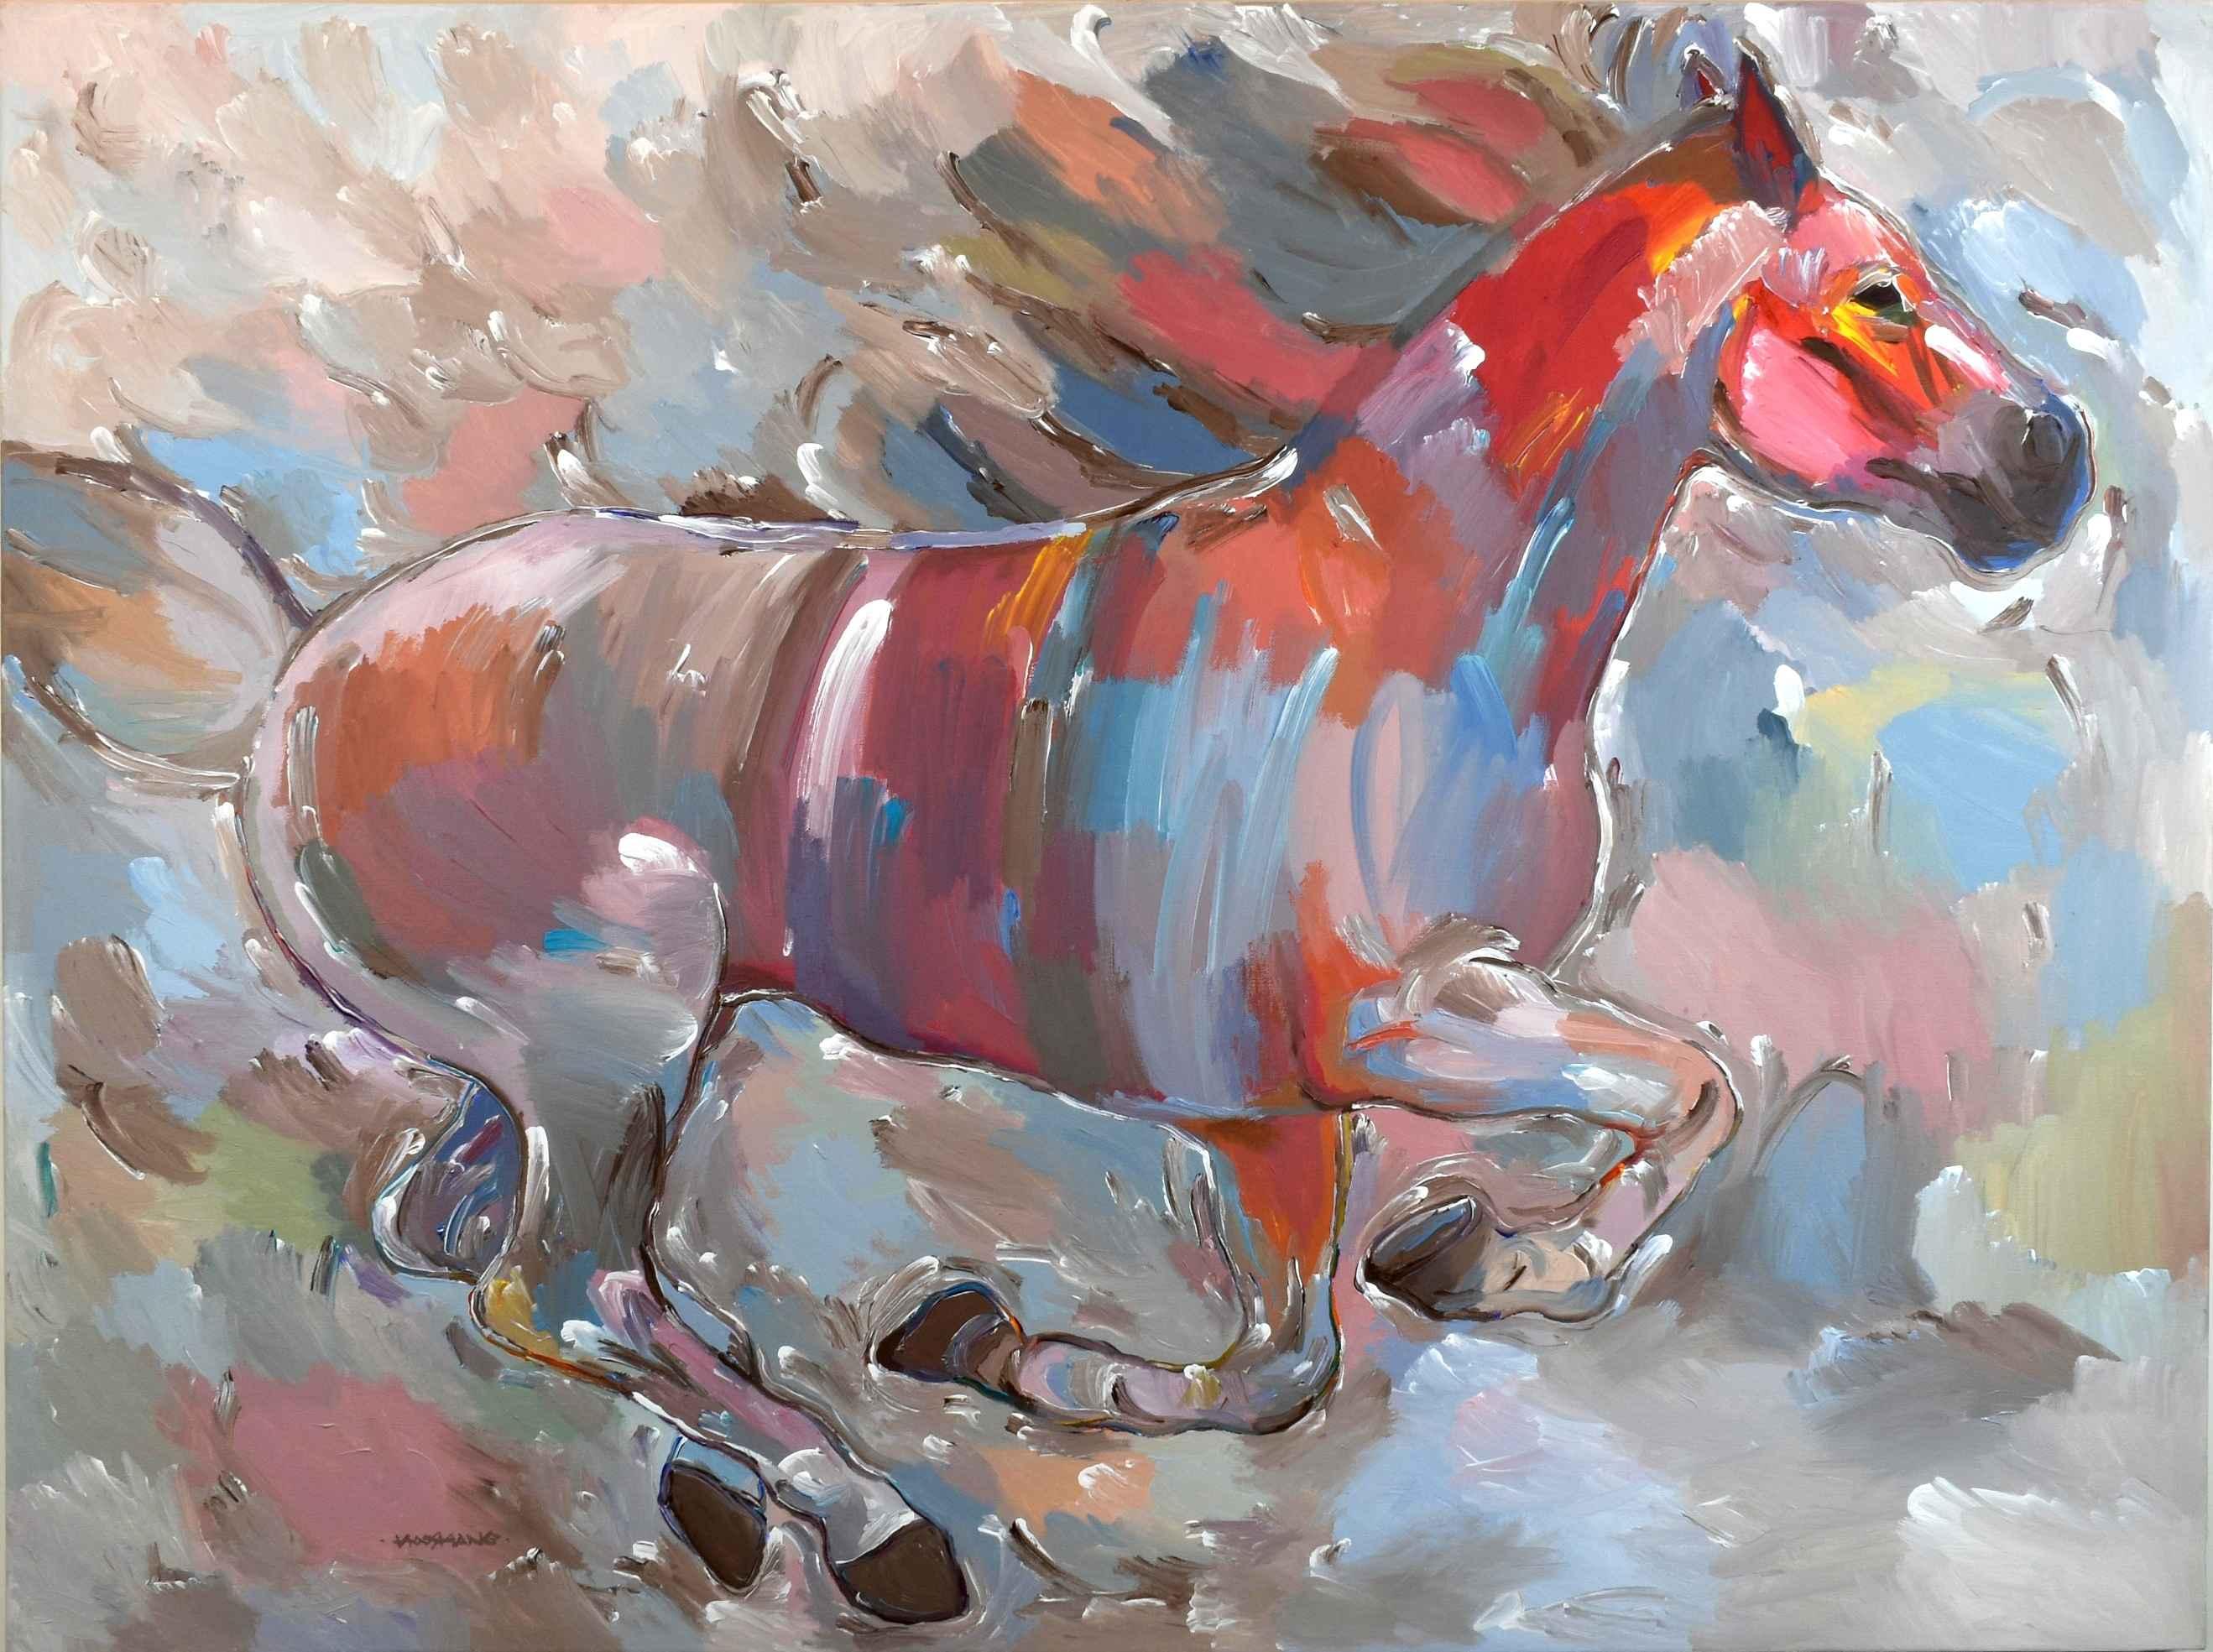 Power Runner by  Hooshang Khorasani - Masterpiece Online